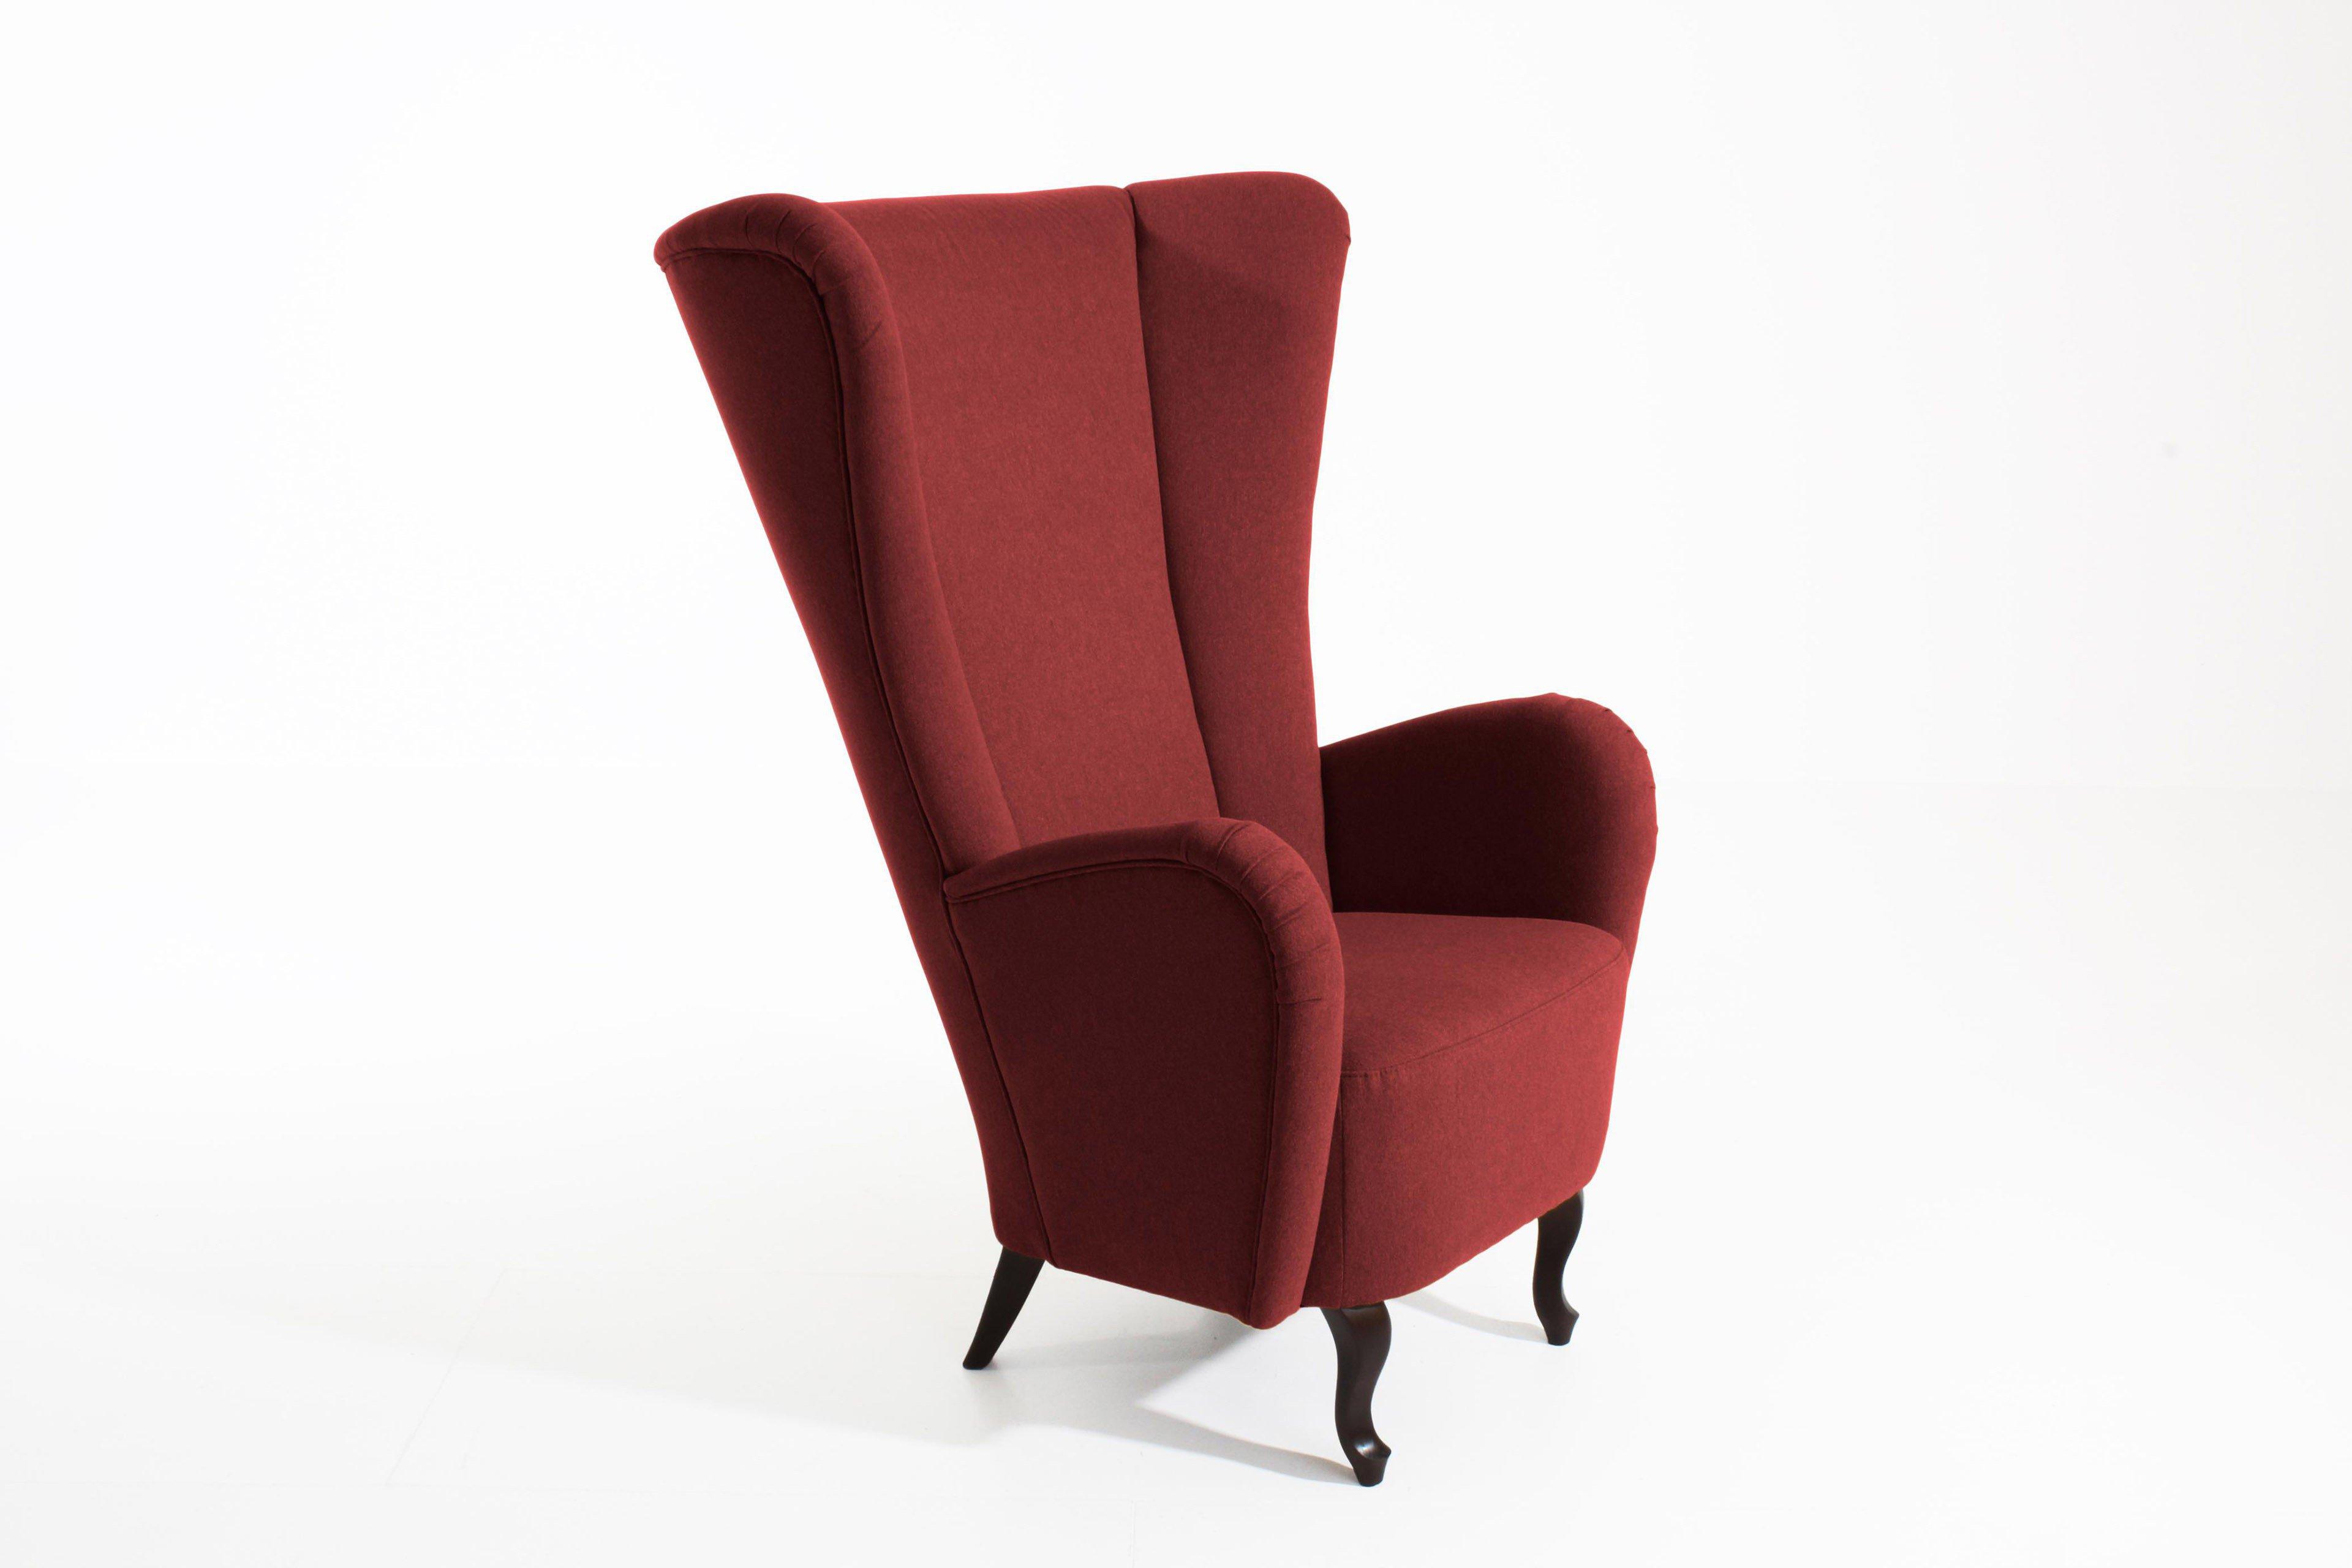 max winzer aurora sessel in rot m bel letz ihr online shop. Black Bedroom Furniture Sets. Home Design Ideas